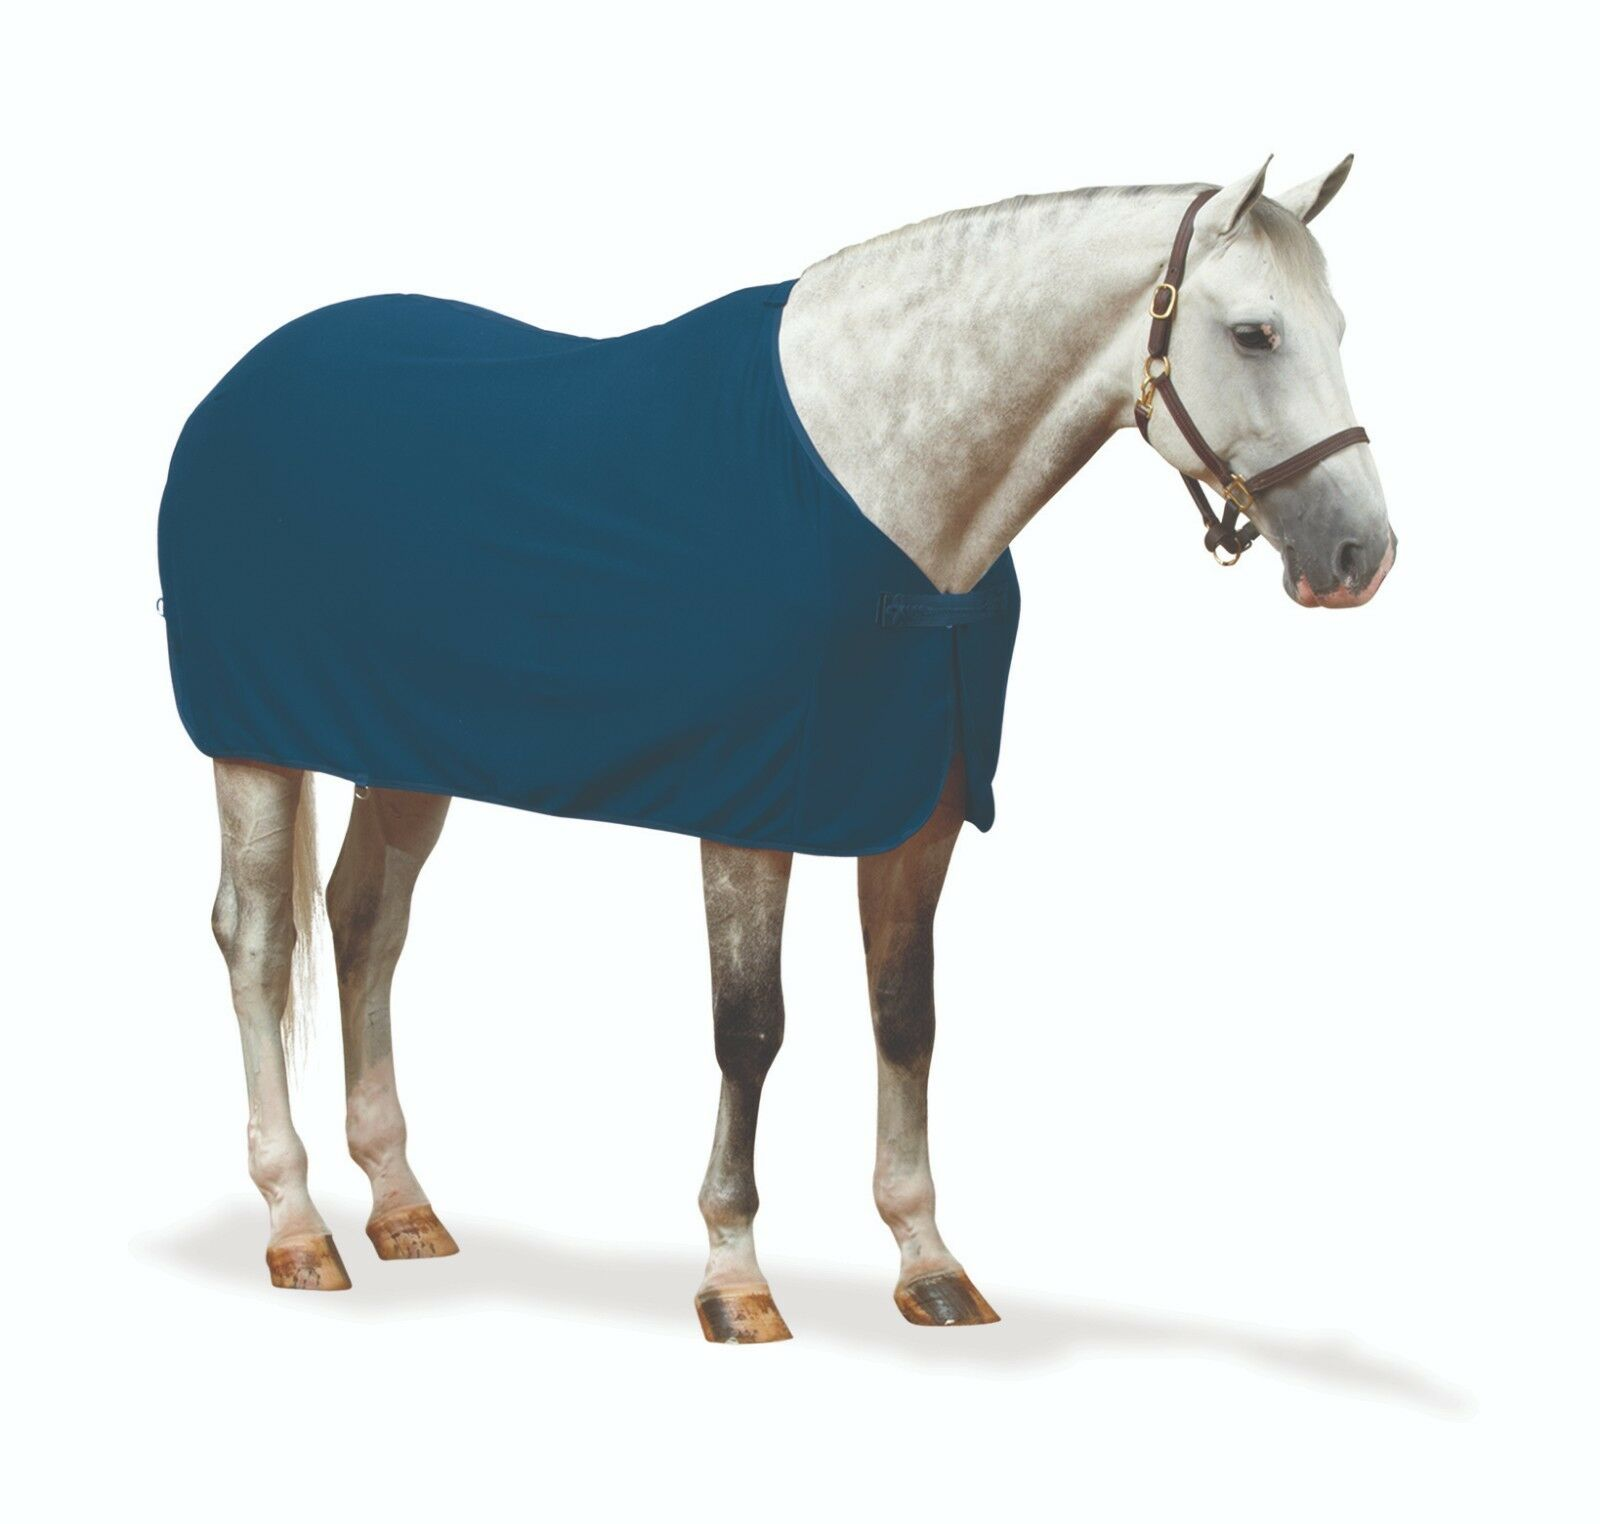 Centaur Turbo-refrigerador de vestir seco-Azul Marino-tamaños diferentes